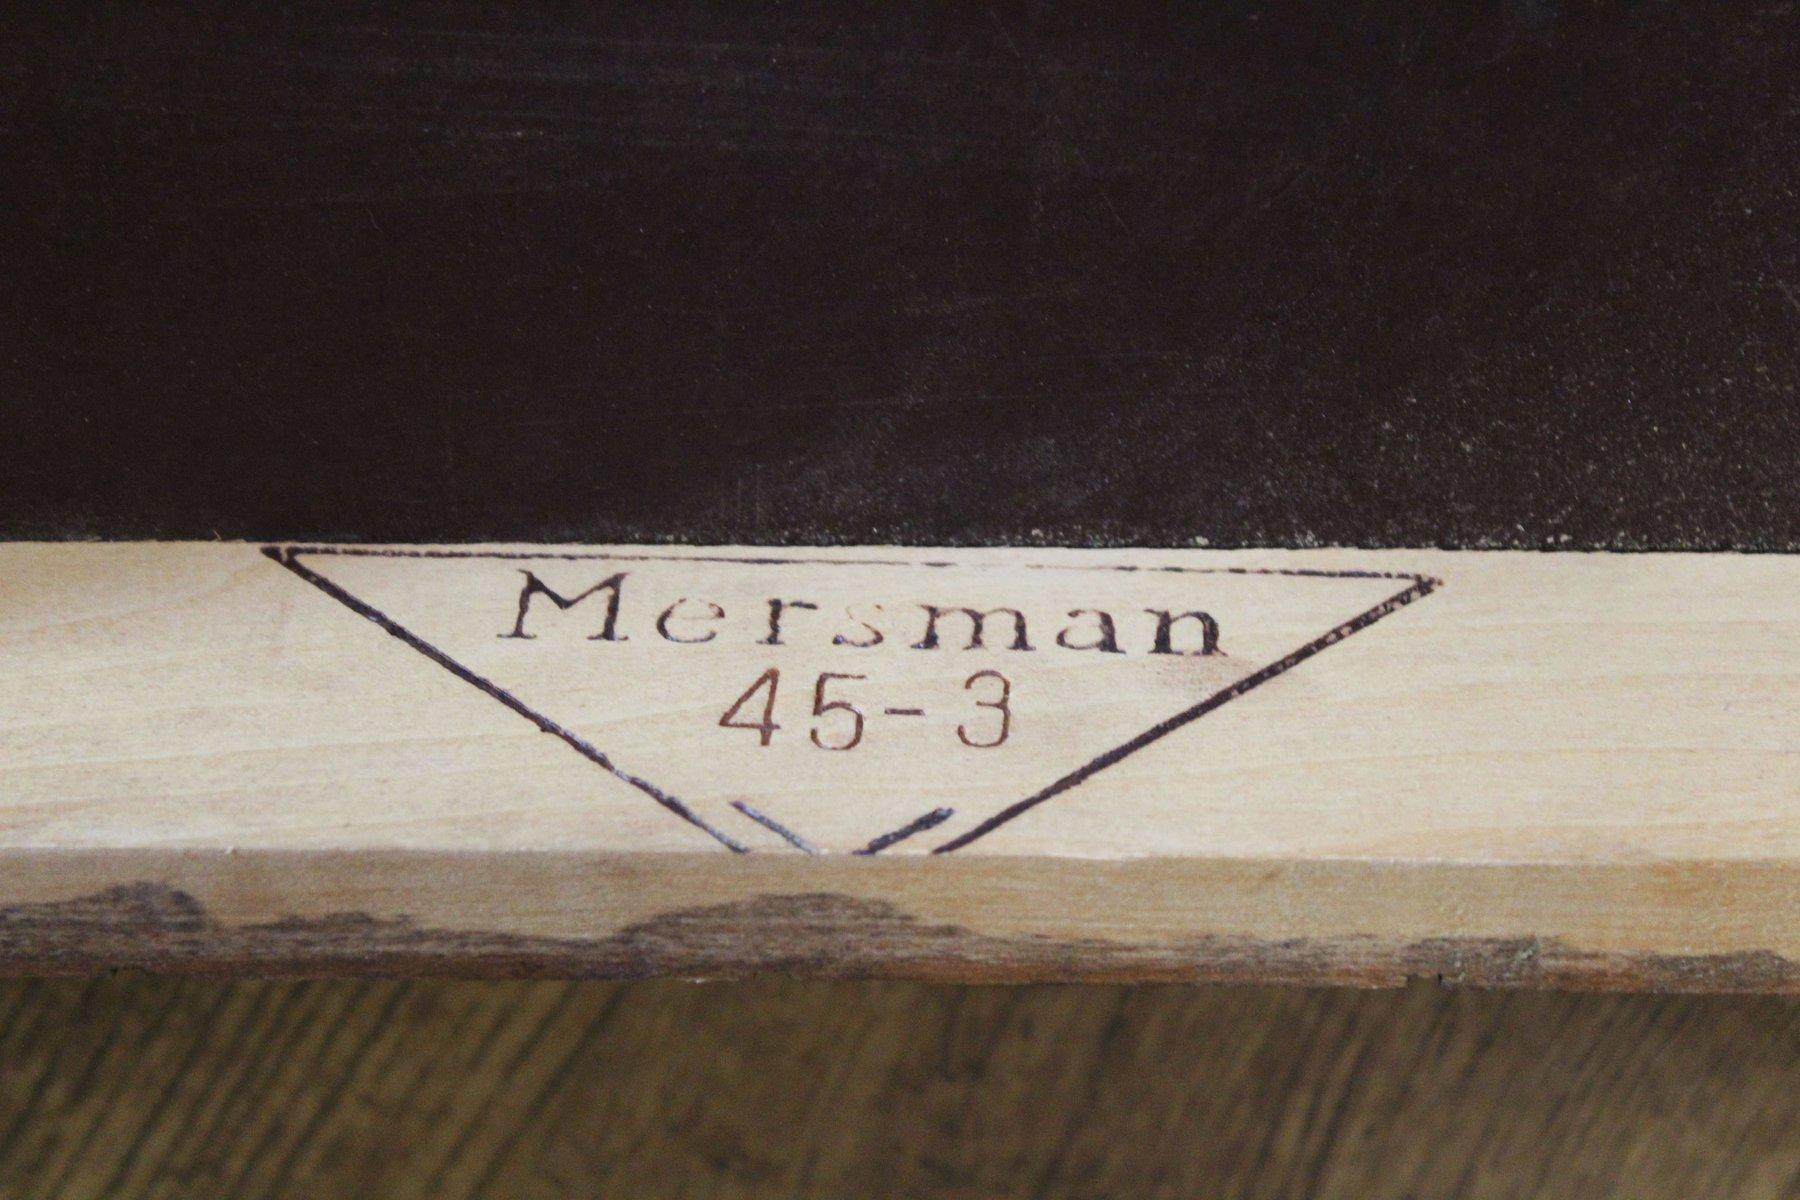 Dating Mersman Möbel